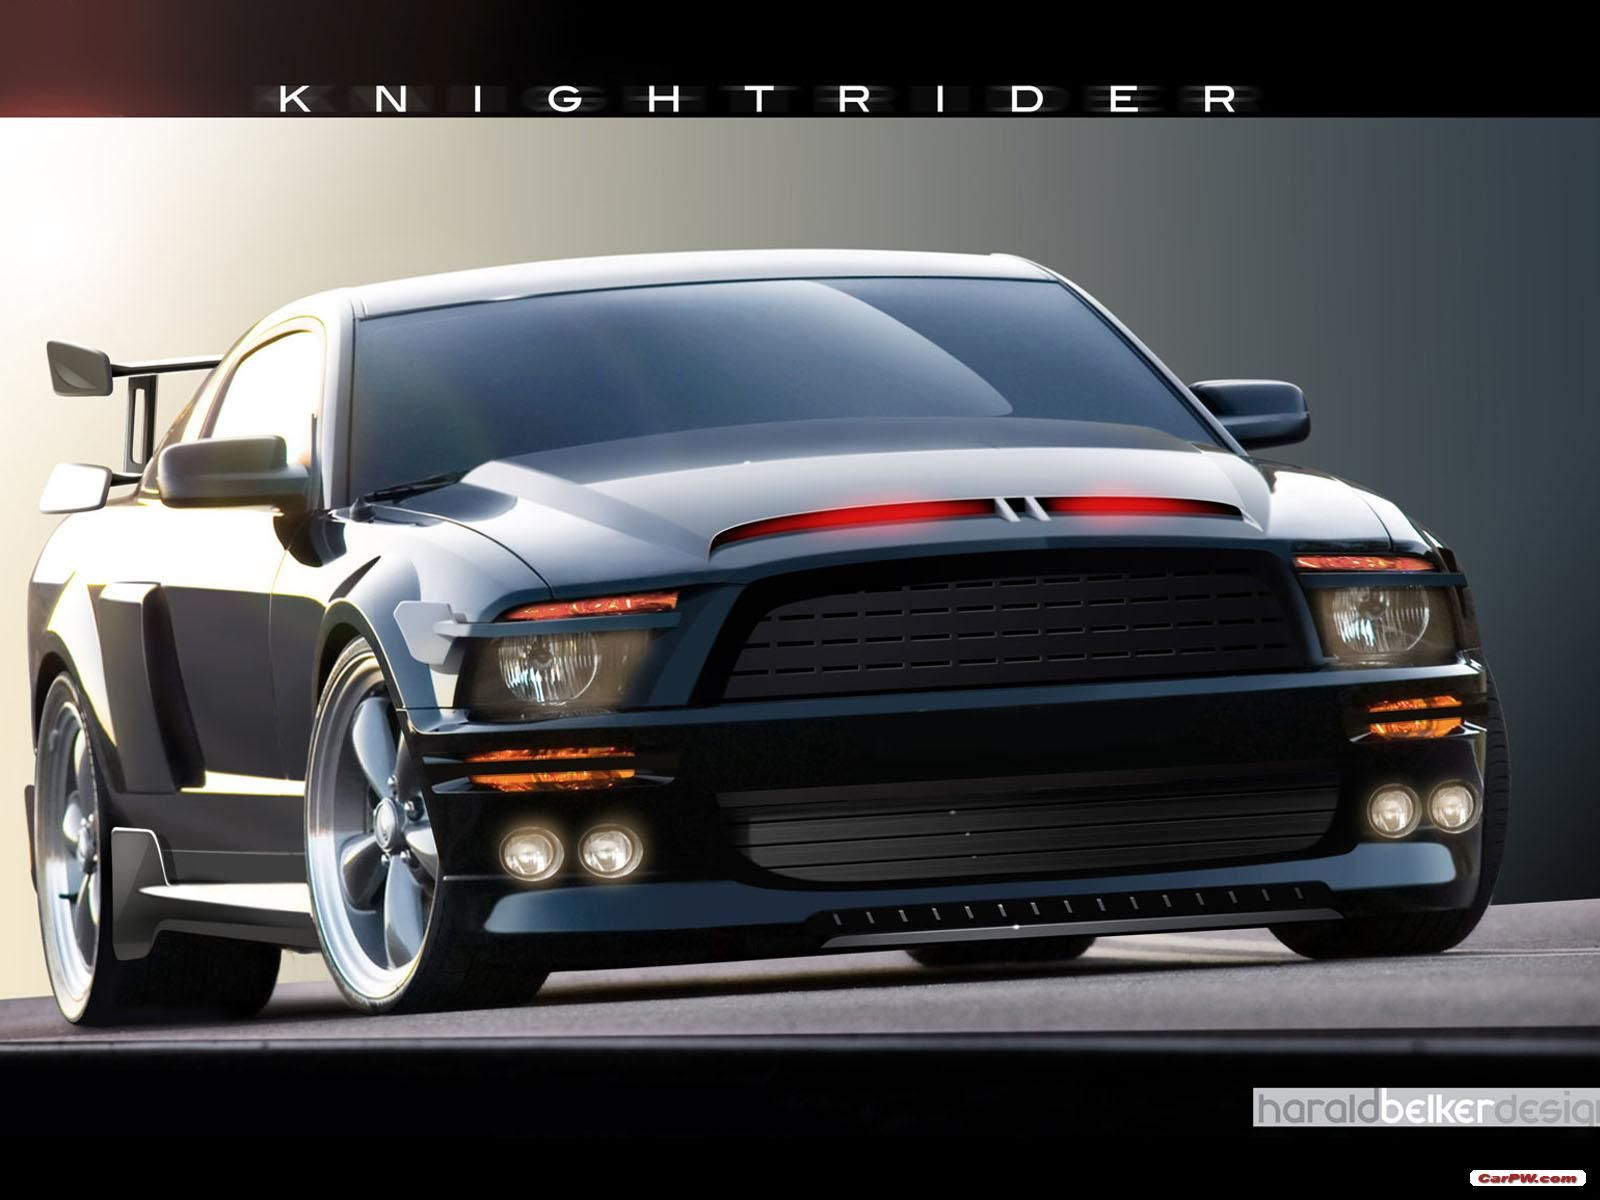 Knight rider k i t t ford mustang shelby gt500